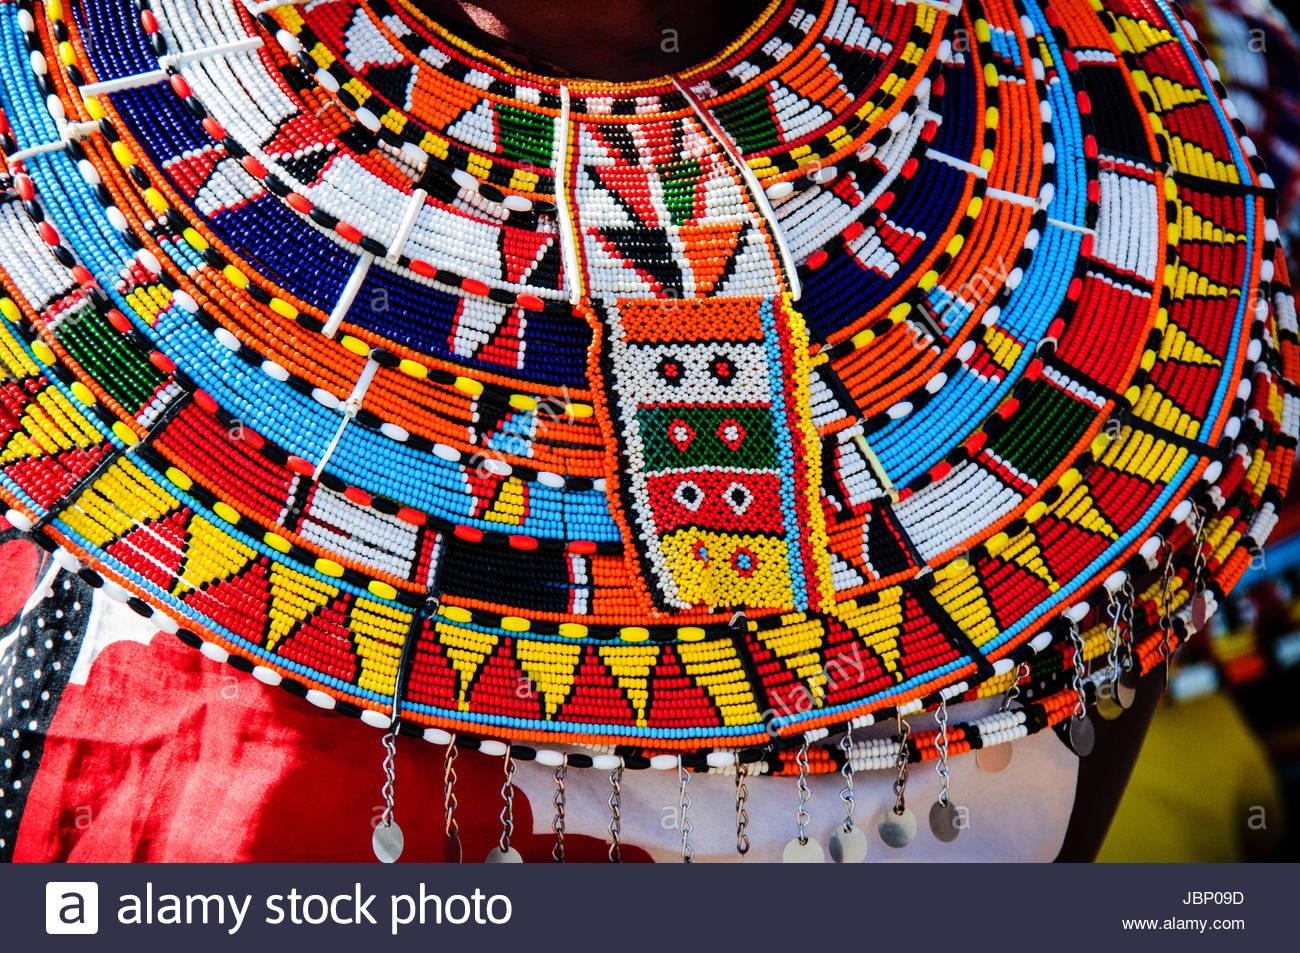 Colorful Traditional Beaded Necklace Worn By Samburu Maasai Women In Northern Kenya East Africa Stock Photo Beaded Beaded Necklace African Beads Necklace